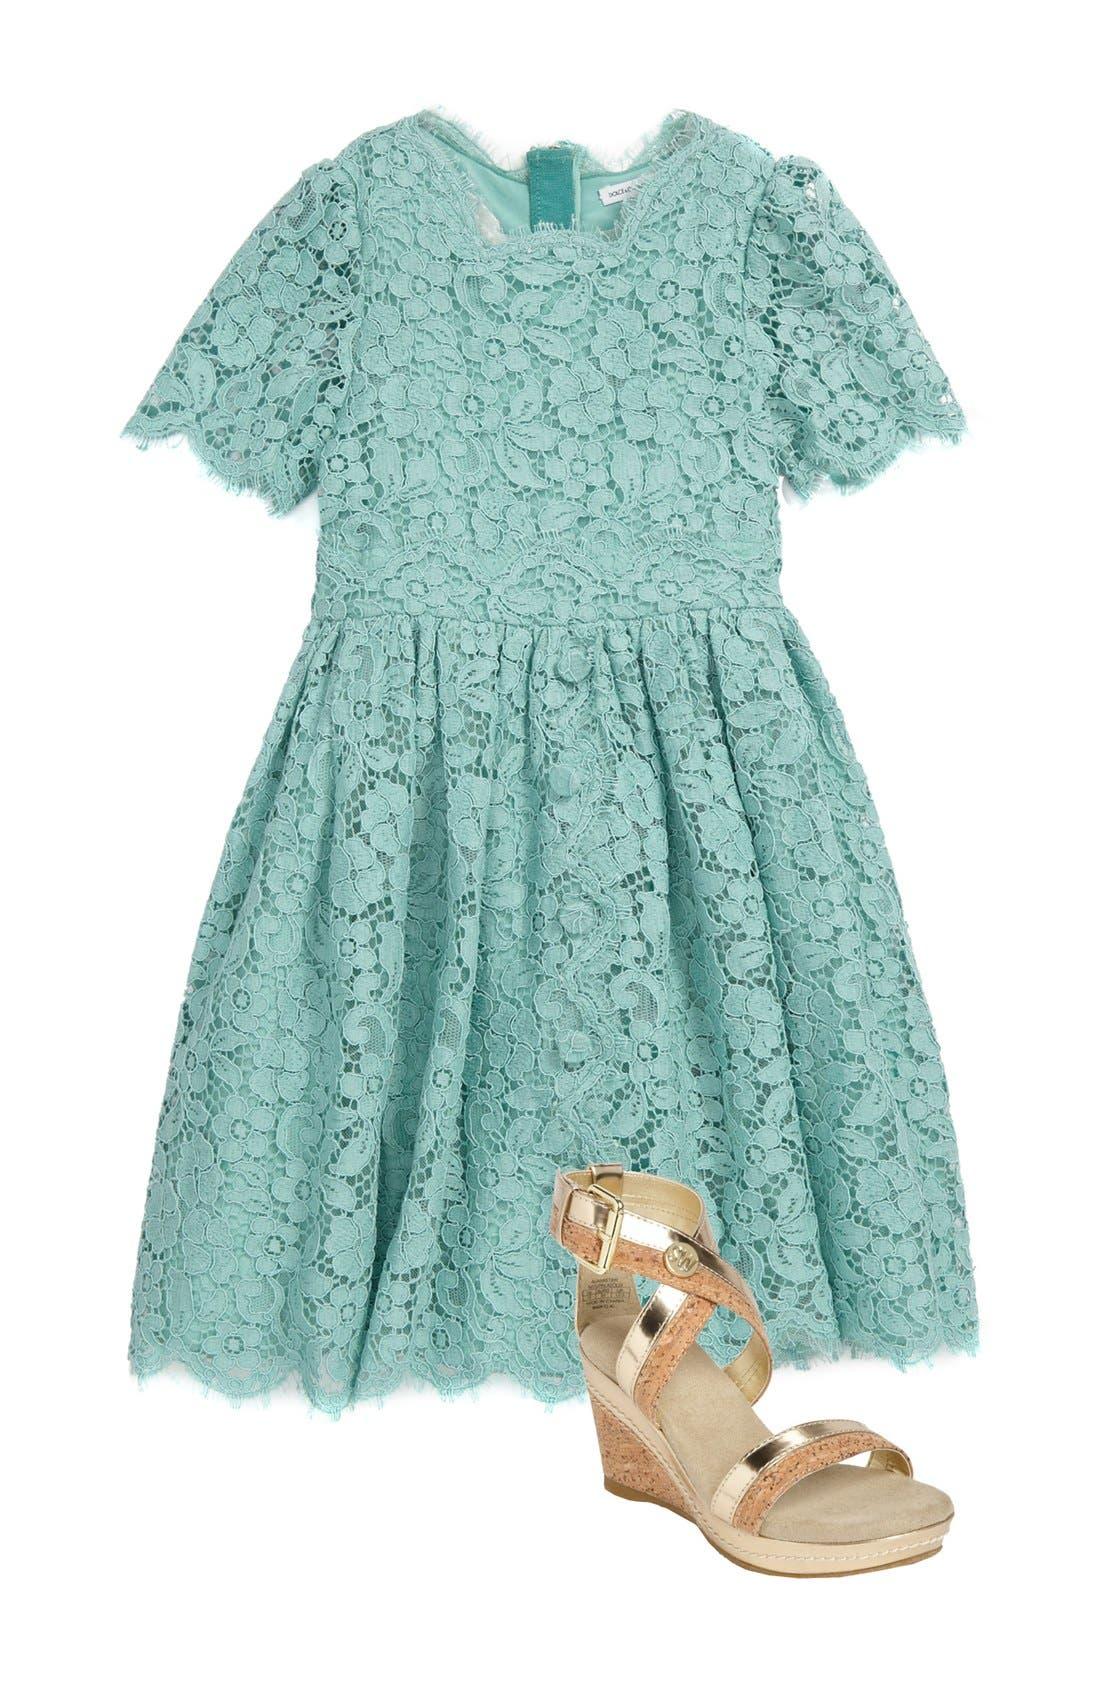 Main Image - Dolce&Gabbana Dress & Stuart Weitzman Sandal (Little Girls & Big Girls)